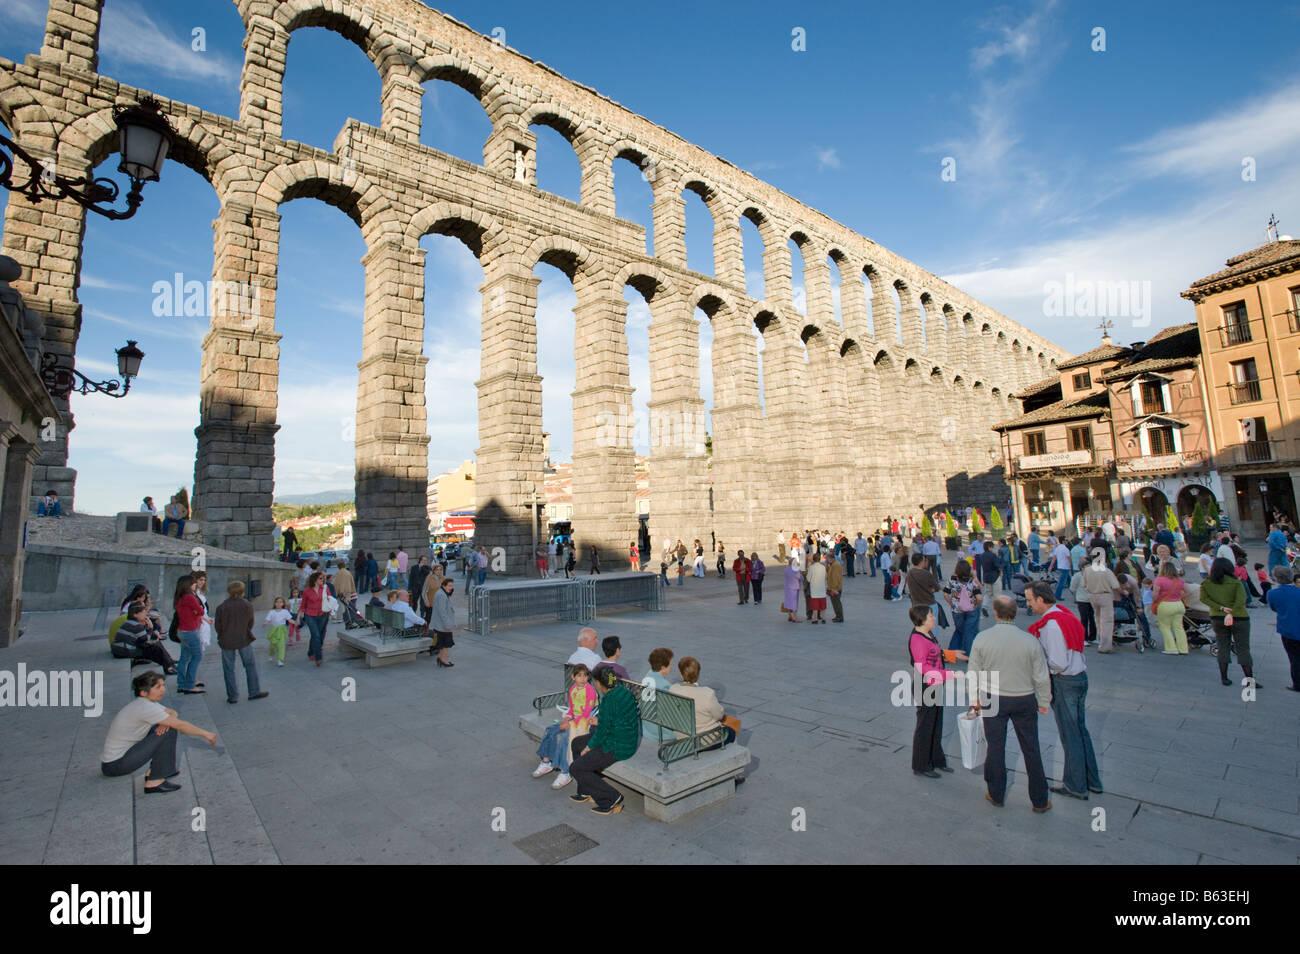 The Roman Aqueduct at Segovia, Spain. - Stock Image